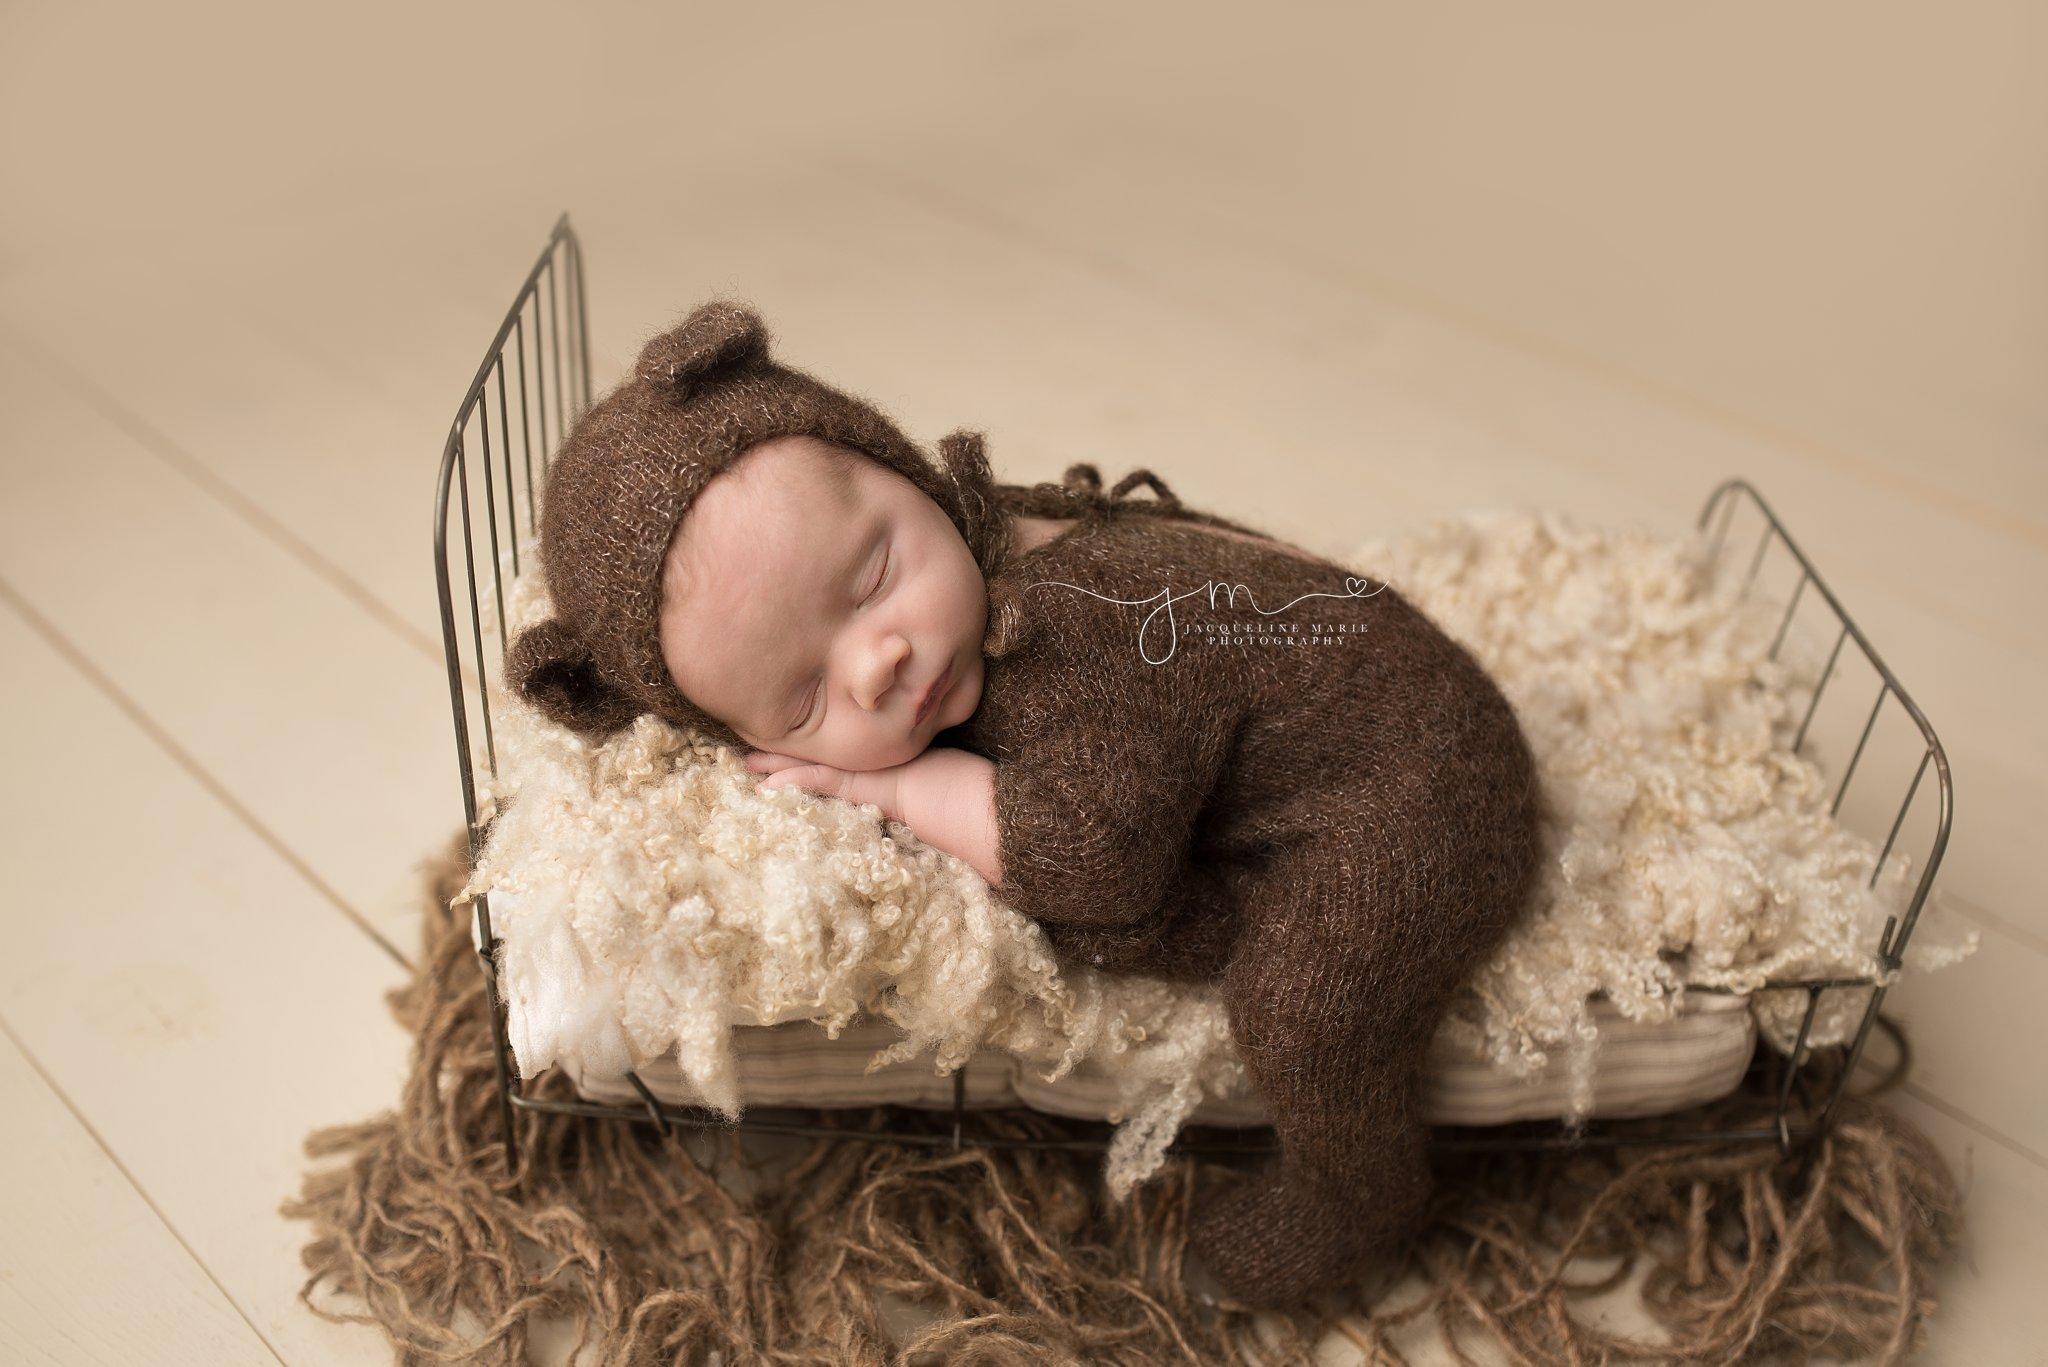 newborn baby wears teddy bear bonnet for newborn photography session in columbus ohio